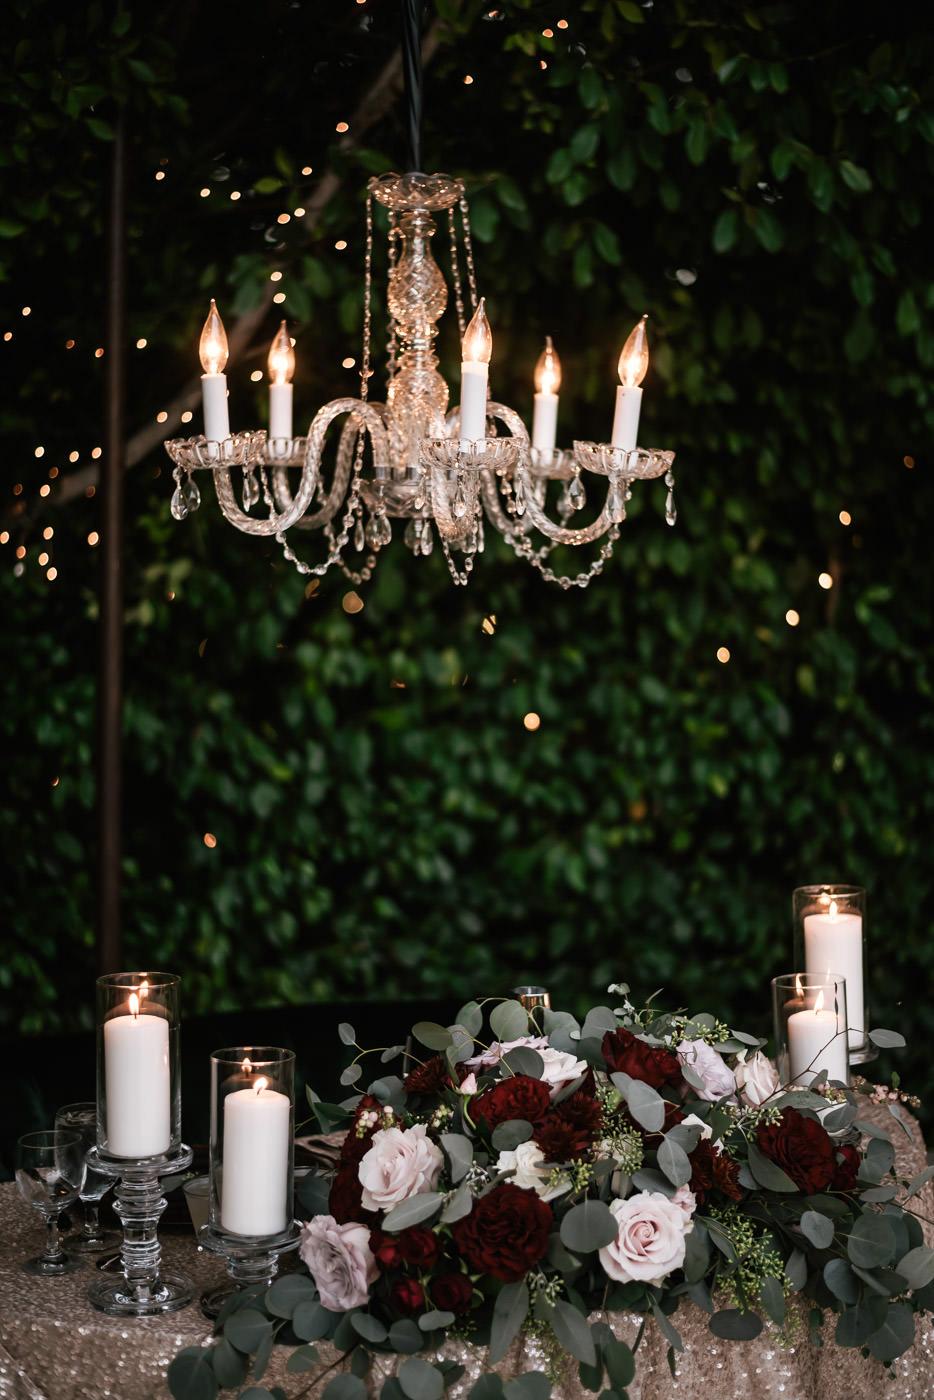 eden-gardens-wedding-photographer-romantic-89.jpg